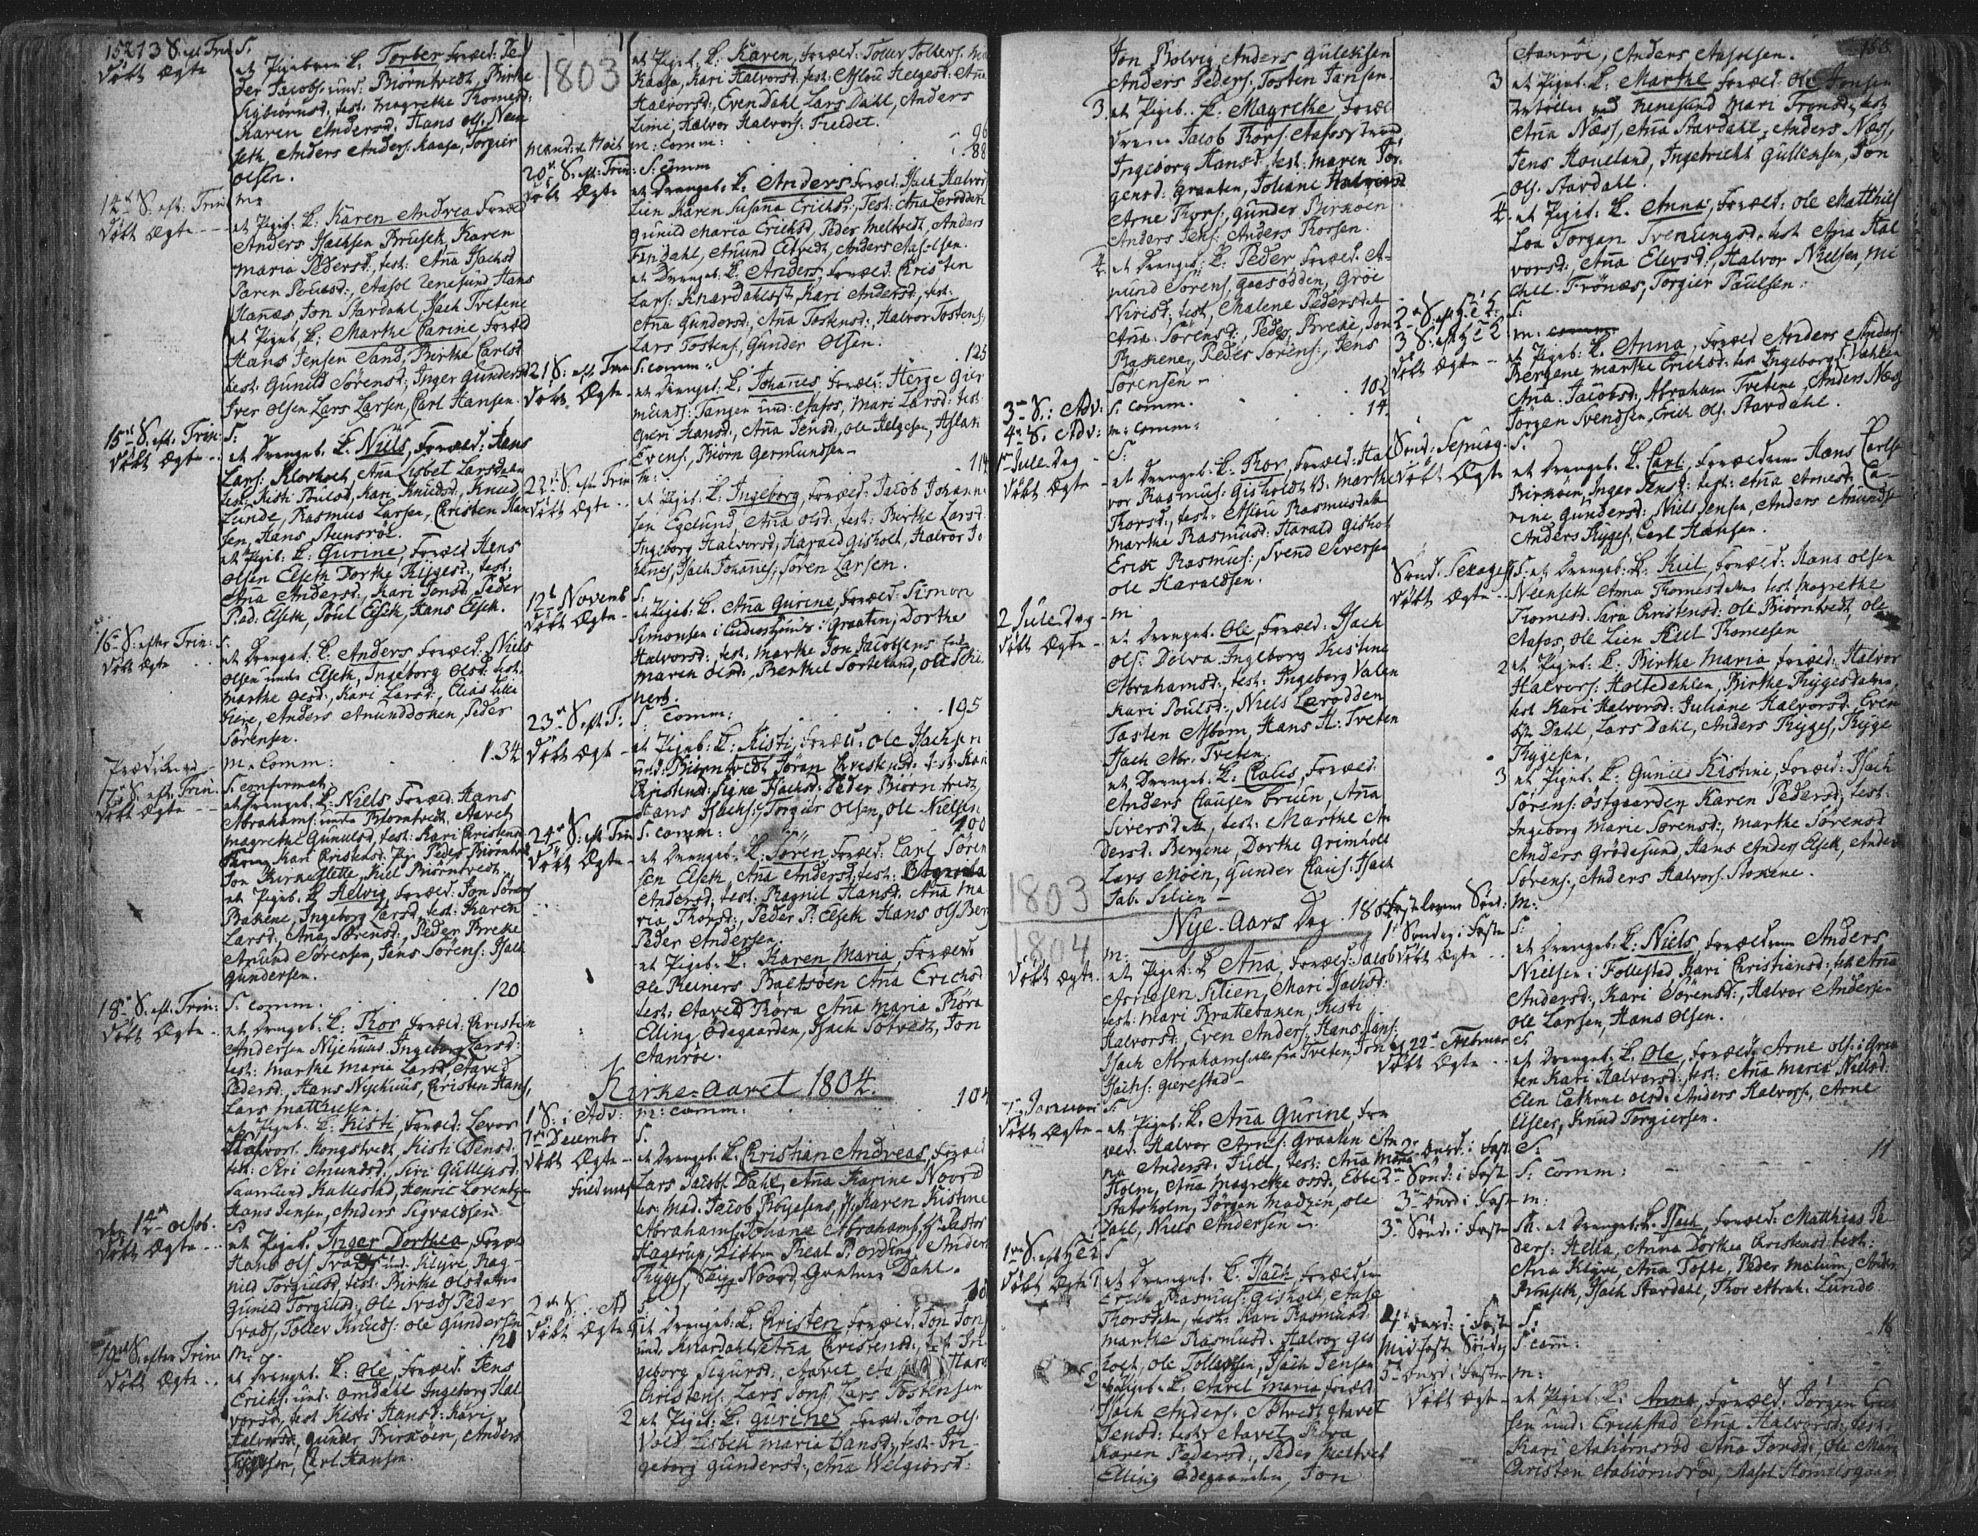 SAKO, Solum kirkebøker, F/Fa/L0003: Ministerialbok nr. I 3, 1761-1814, s. 152-153